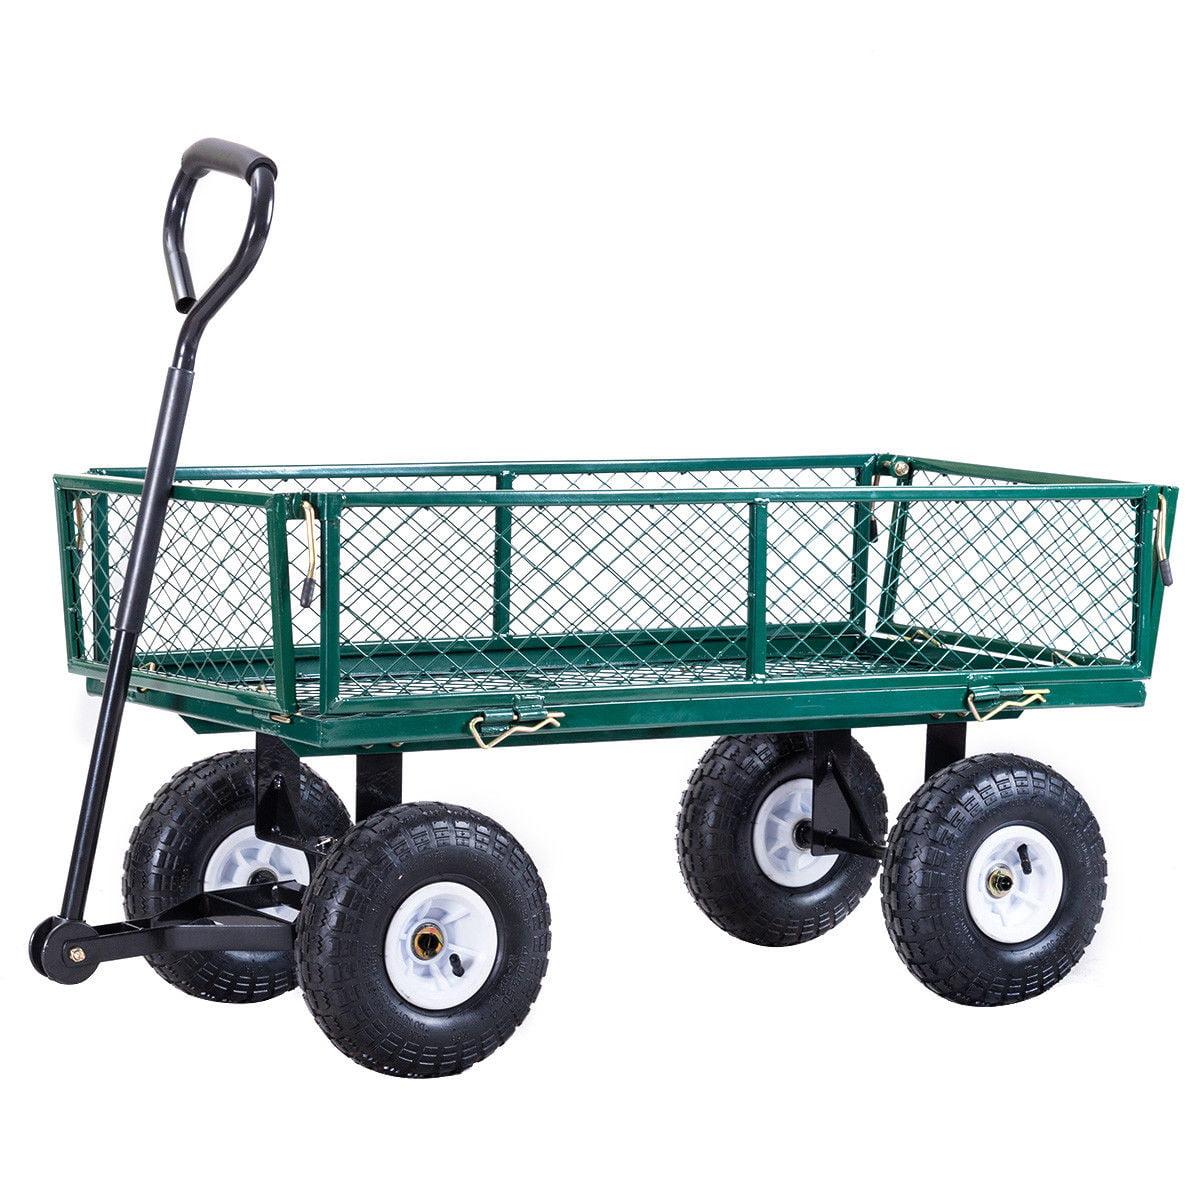 Gymax Heavy Duty Lawn Garden Utility Cart Wagon Wheelbarrow Steel Trailer